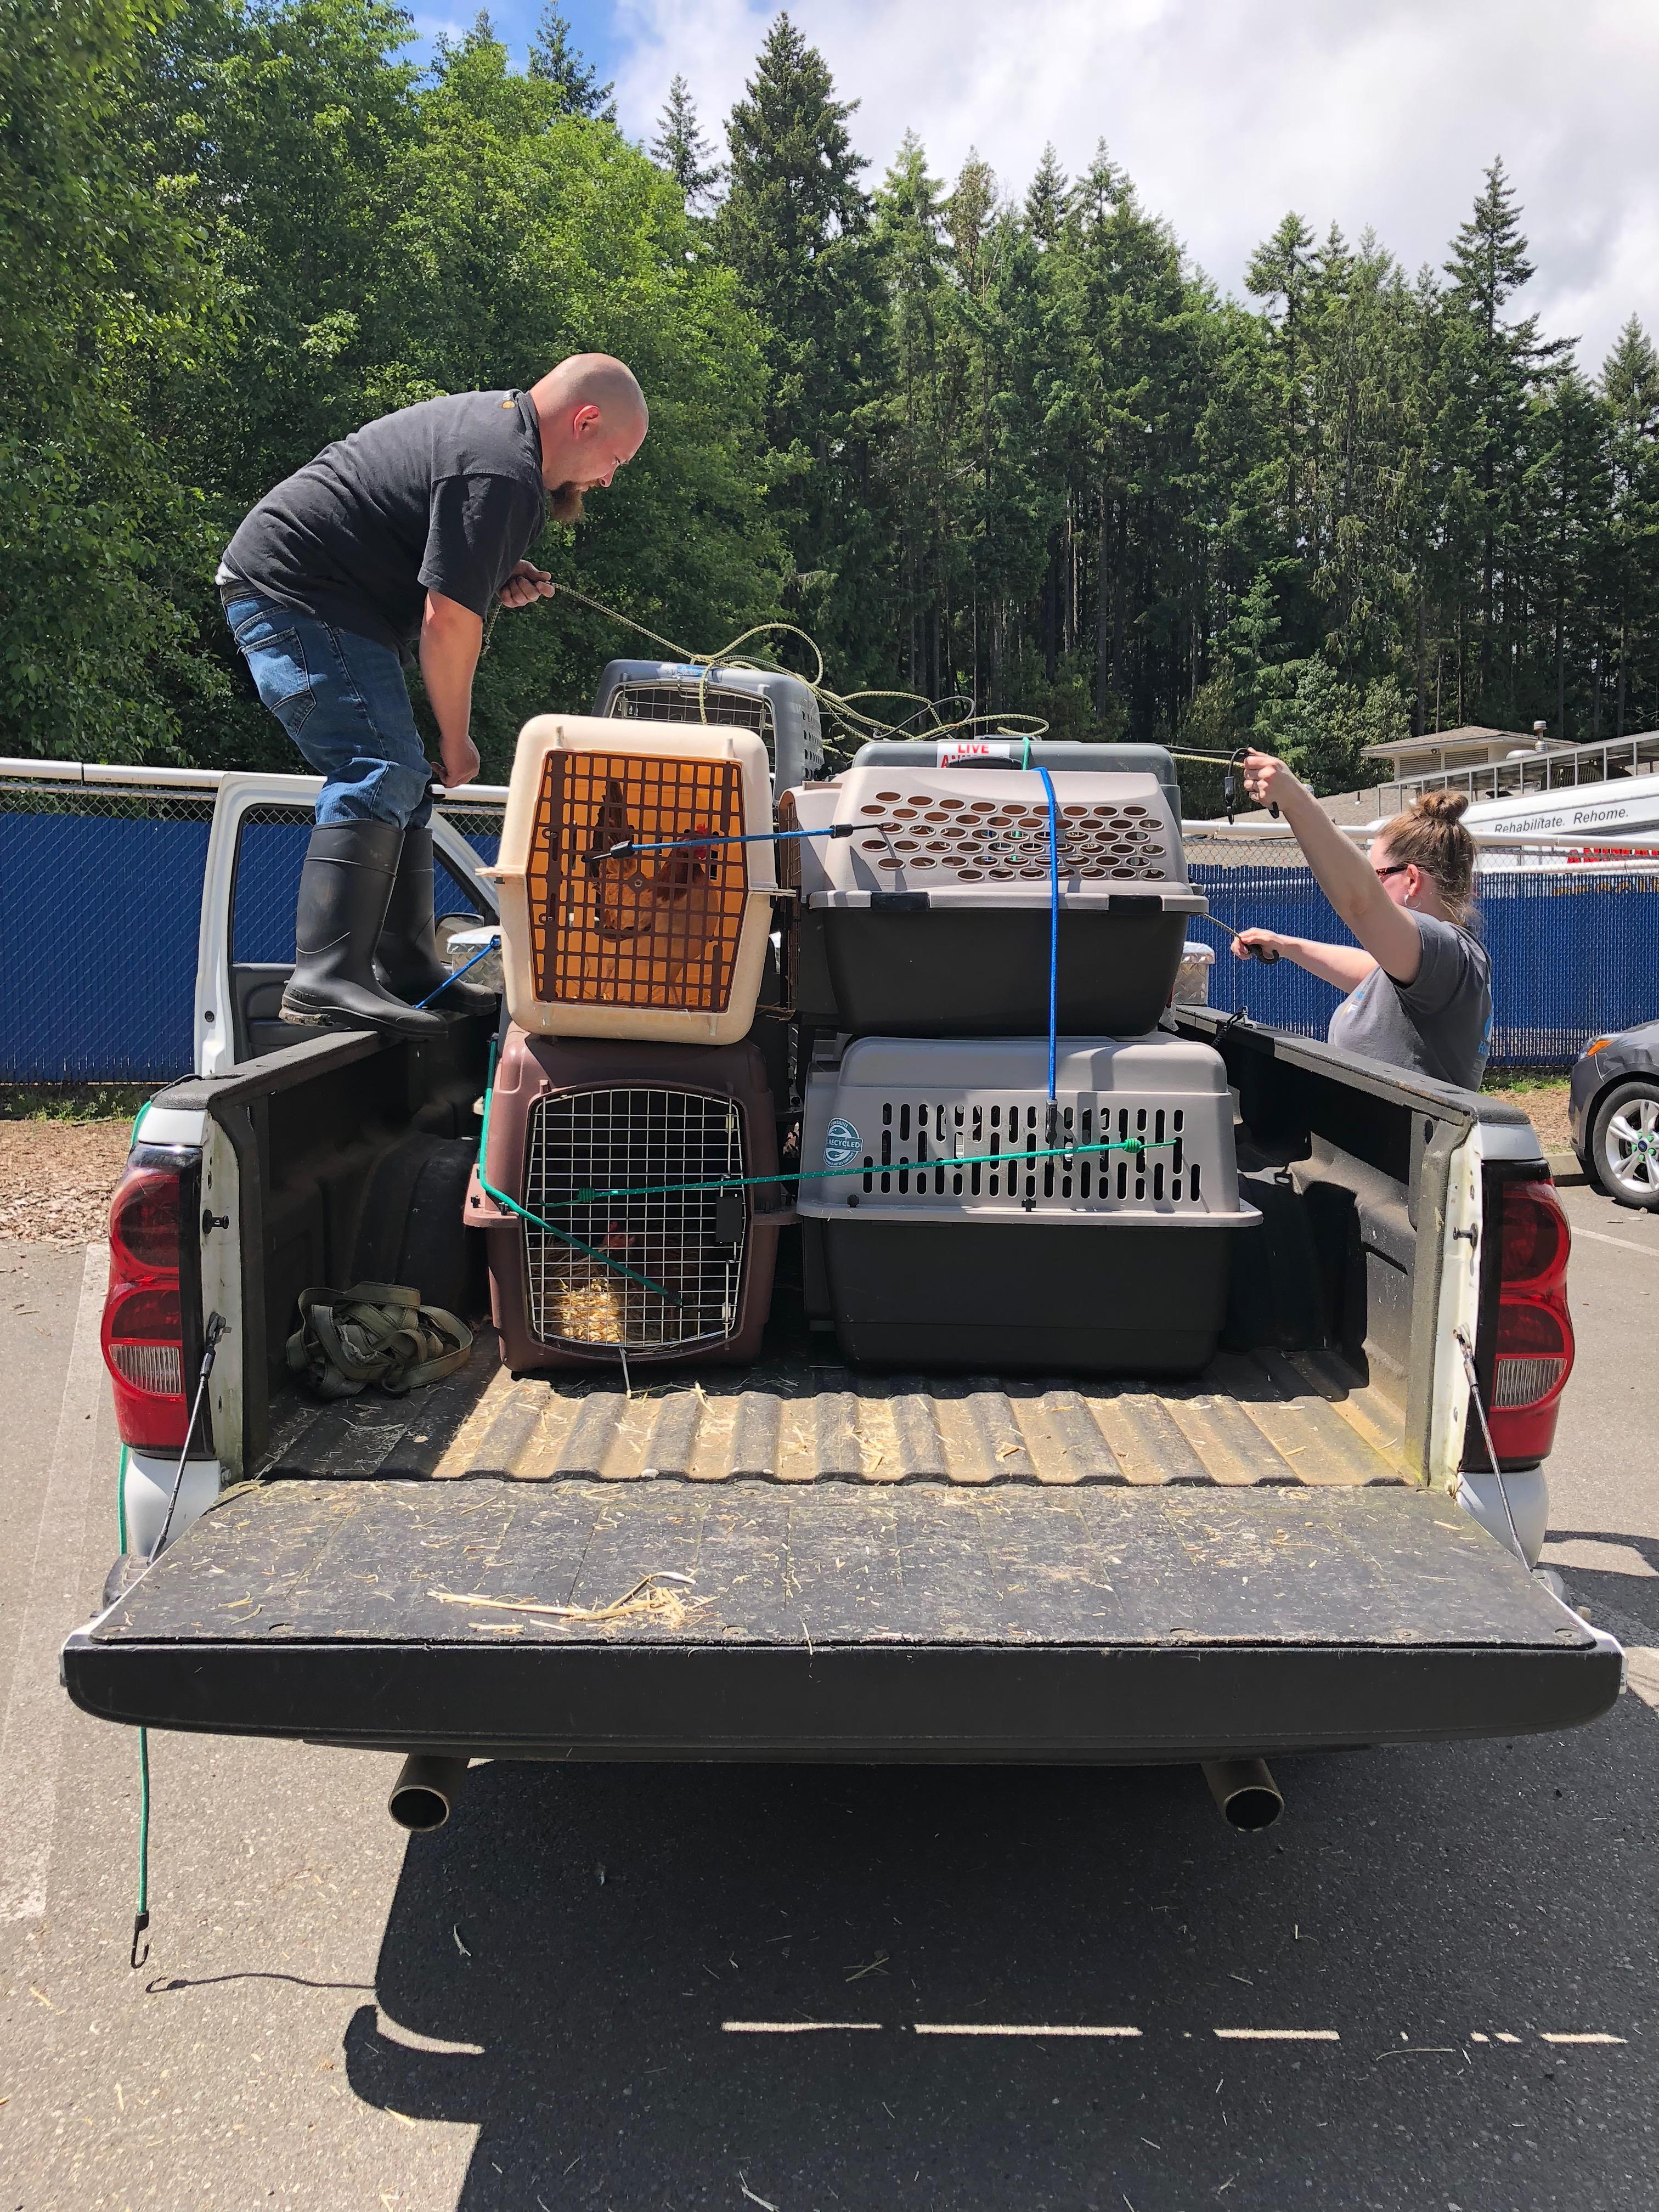 Kitsap Humane Society | KHS Rescues Hens & Chicks from